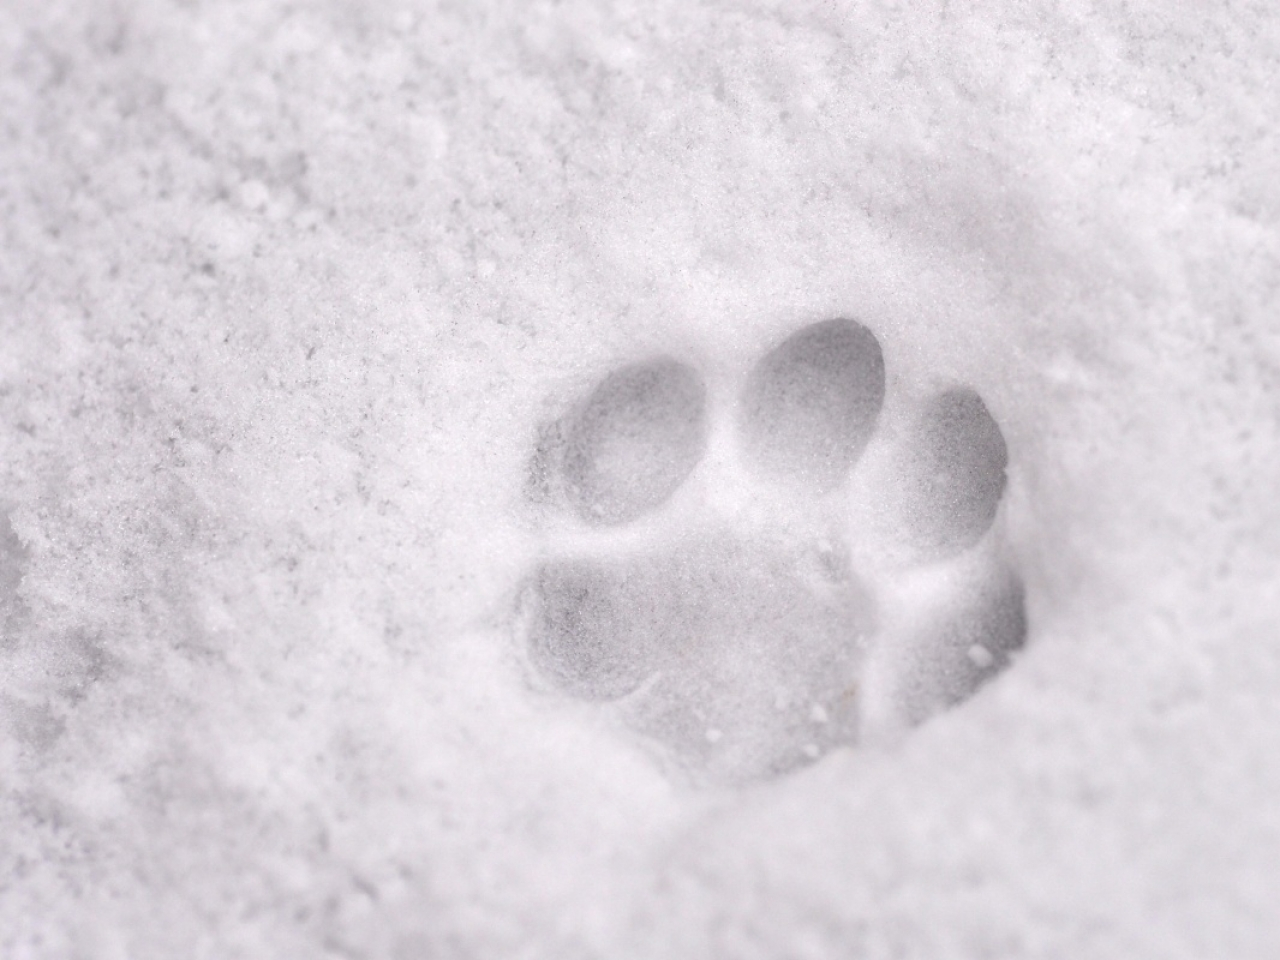 Free Download Snow Animals Paw Print 1280x800 Wallpaper Art Hd Wallpaper Download 1280x960 For Your Desktop Mobile Tablet Explore 67 Paw Print Wallpaper Dog Paw Print Wallpaper Border Paw